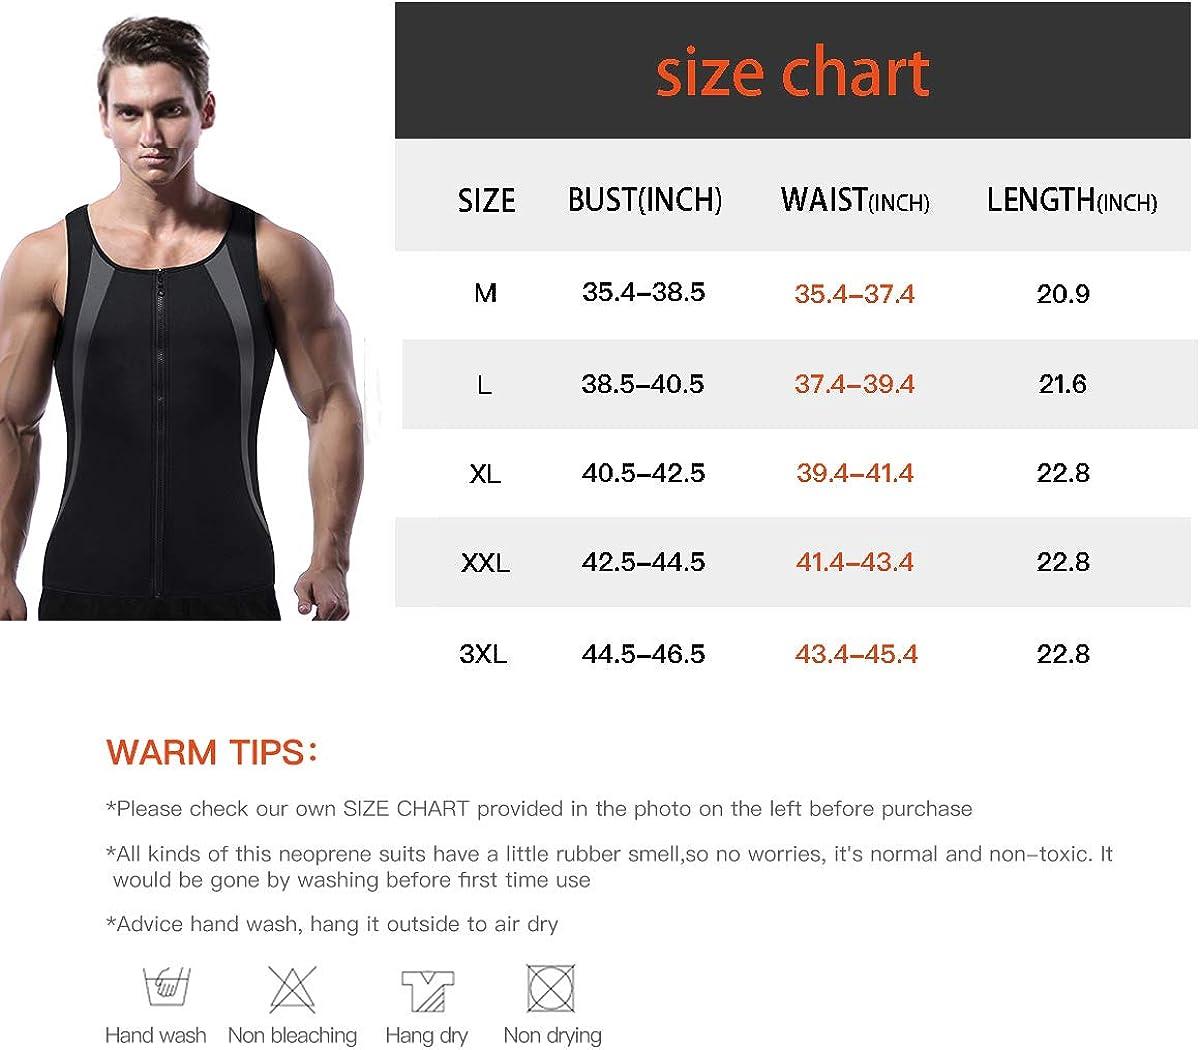 FORENJOY Mens Neoprene Sweat Vest Sauna Suit Body Shaper Weight Loss Zipper Tank Tops Active Training Shirt